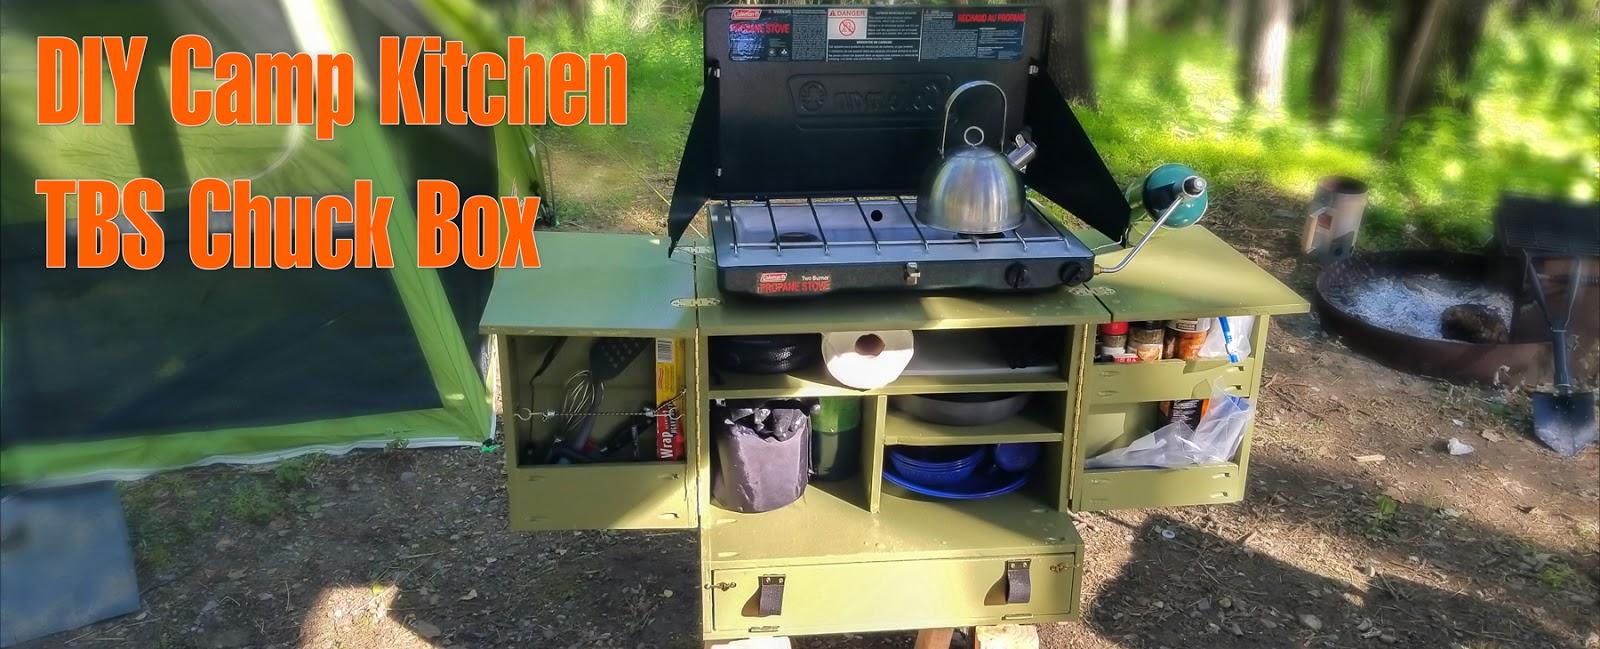 Camping Kitchen Chuck Box Plans